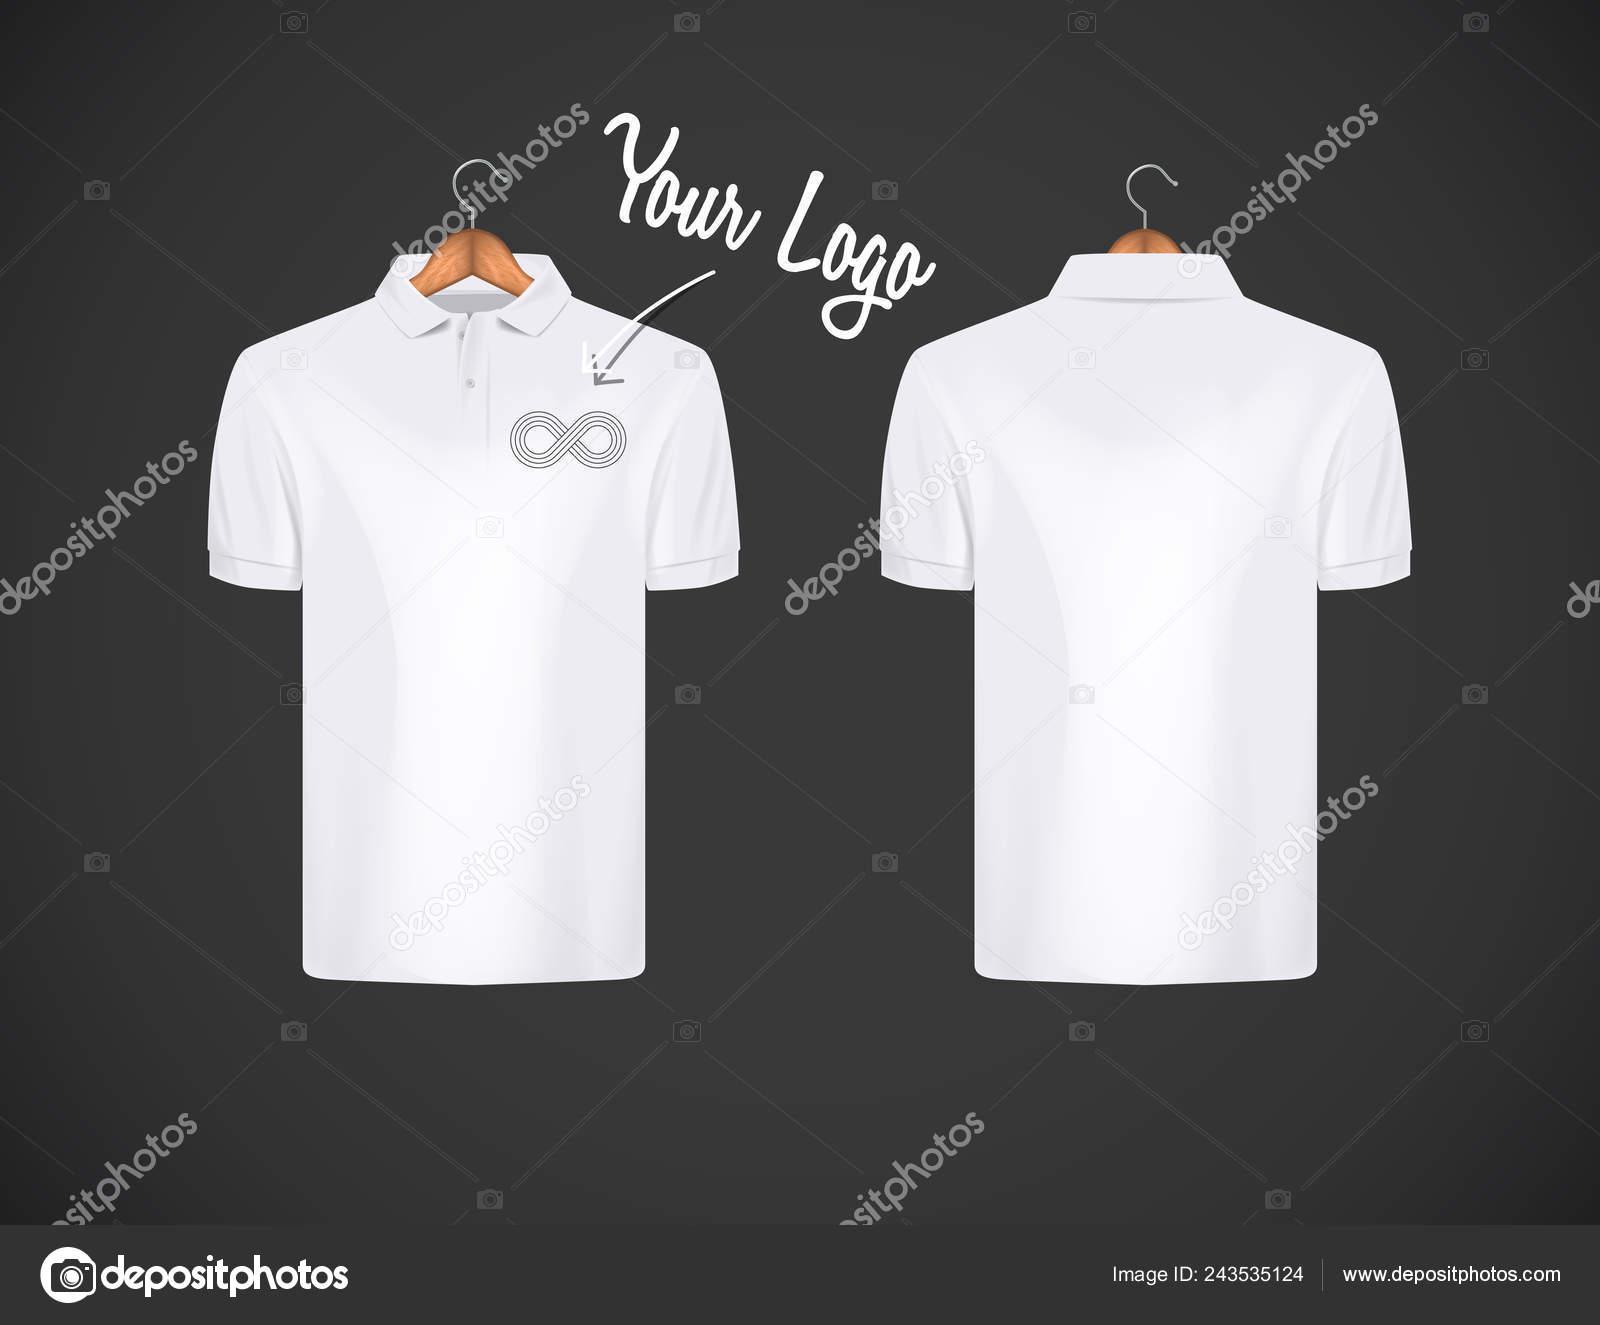 6fabb2334e Camisa de polo de los hombres delgado-guarnición de manga corta con logo  para publicidad. Camisa polo blanca con plantilla de diseño de maqueta  aislada de ...